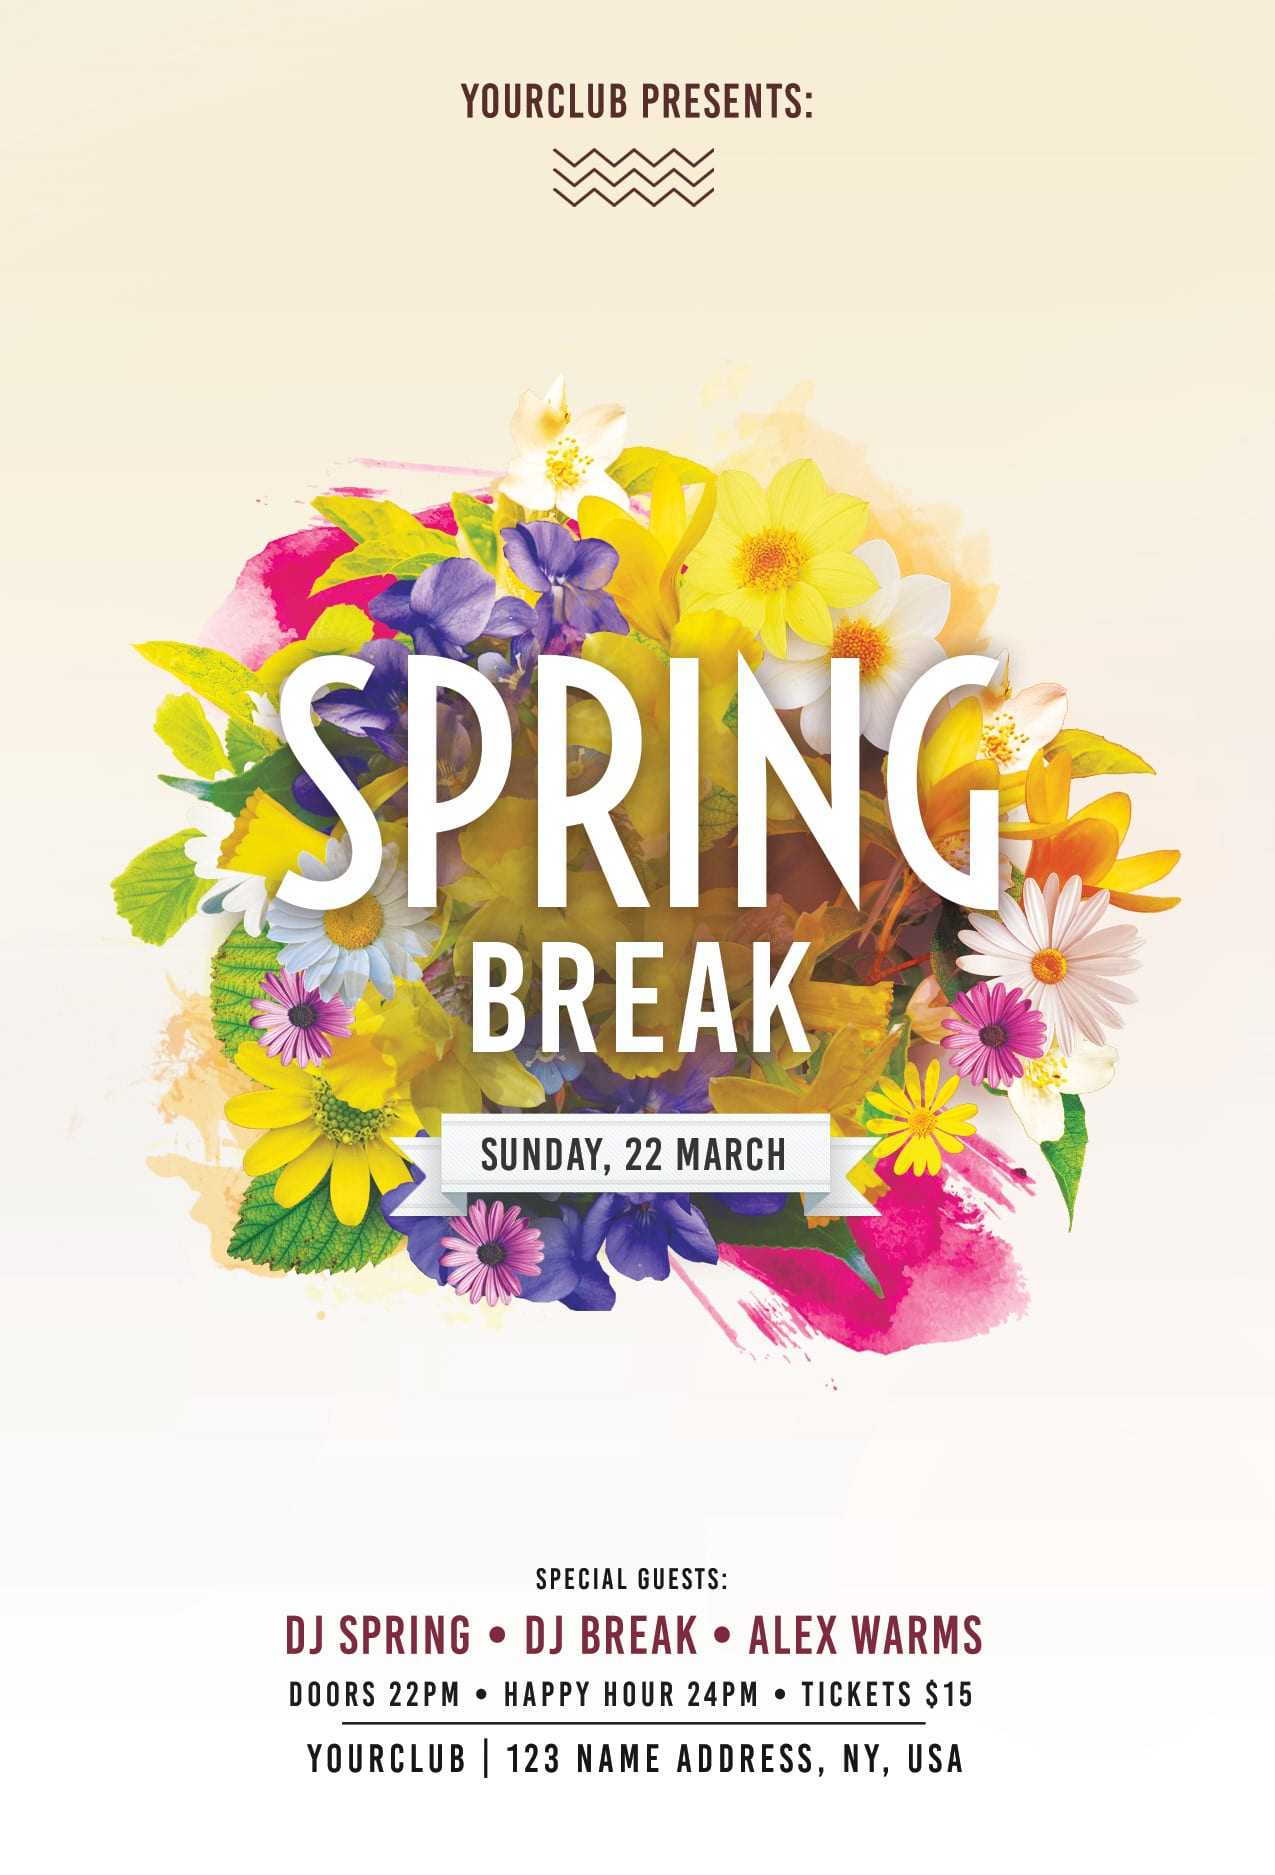 Spring Break Free Psd Flyer Template - Free Psd Flyer Within Free Spring Flyer Templates